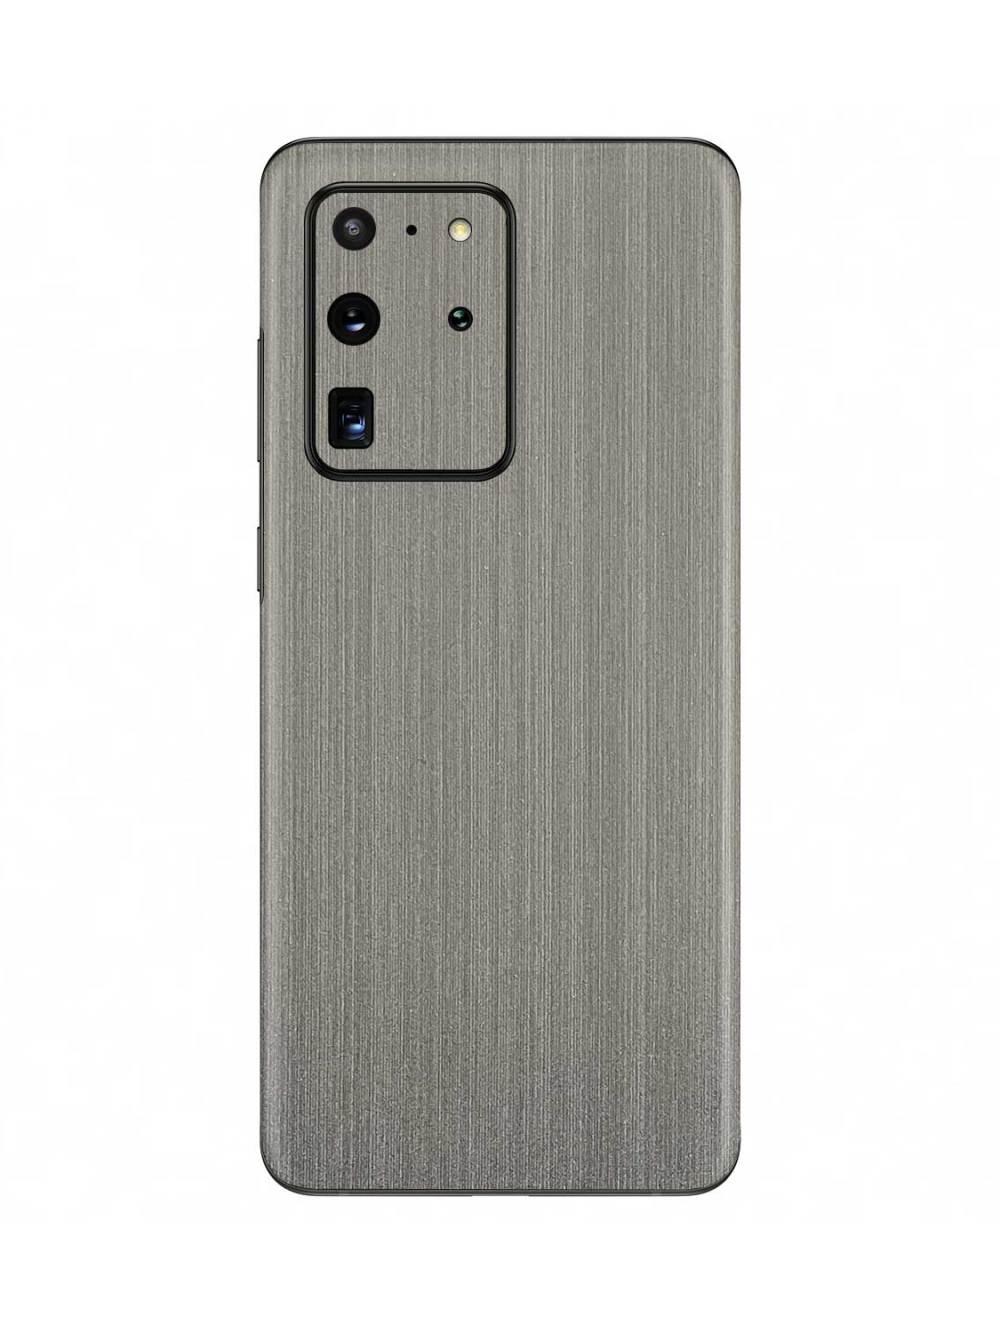 Brushed Silver Metallic skin for Samsung Galaxy S20 Ultra